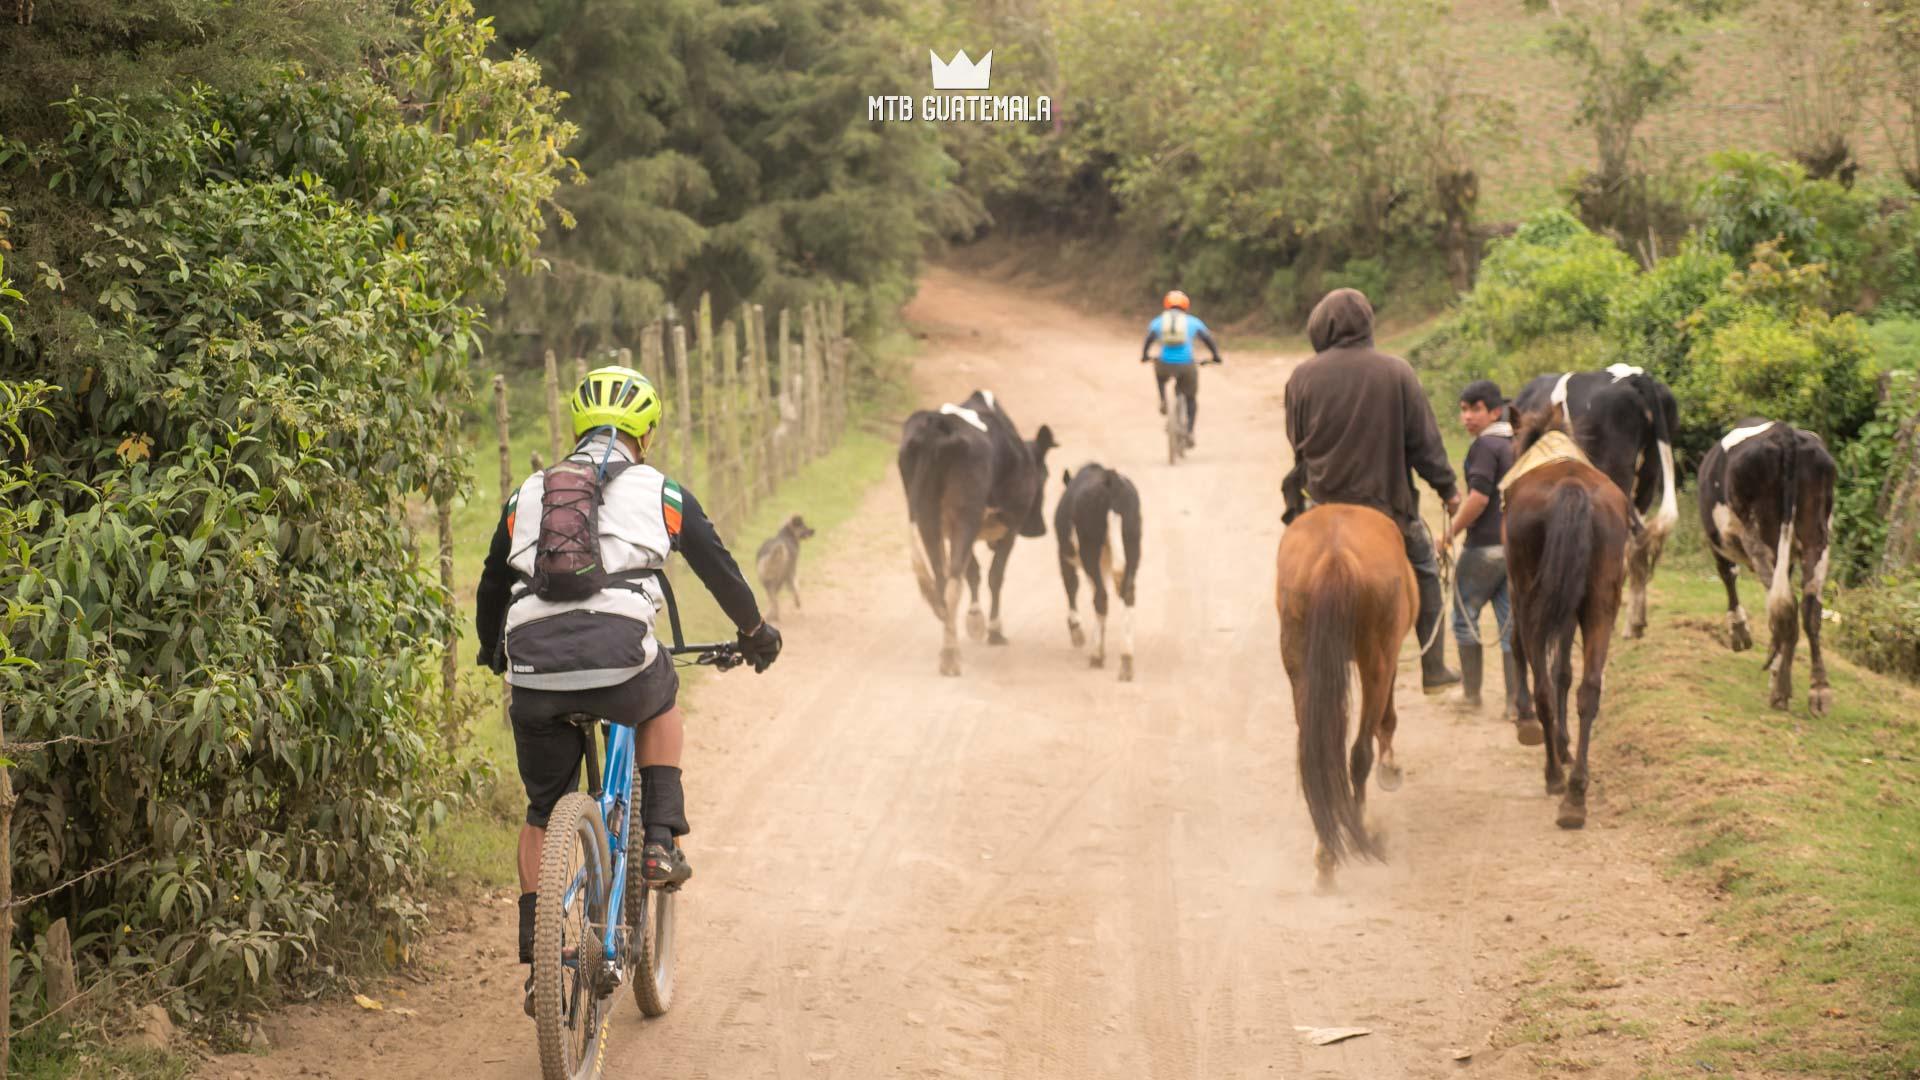 Road traffic in rural Guatemala. Valle Escondido Adventure MTB Tour  Chimaltenango, Guatemala